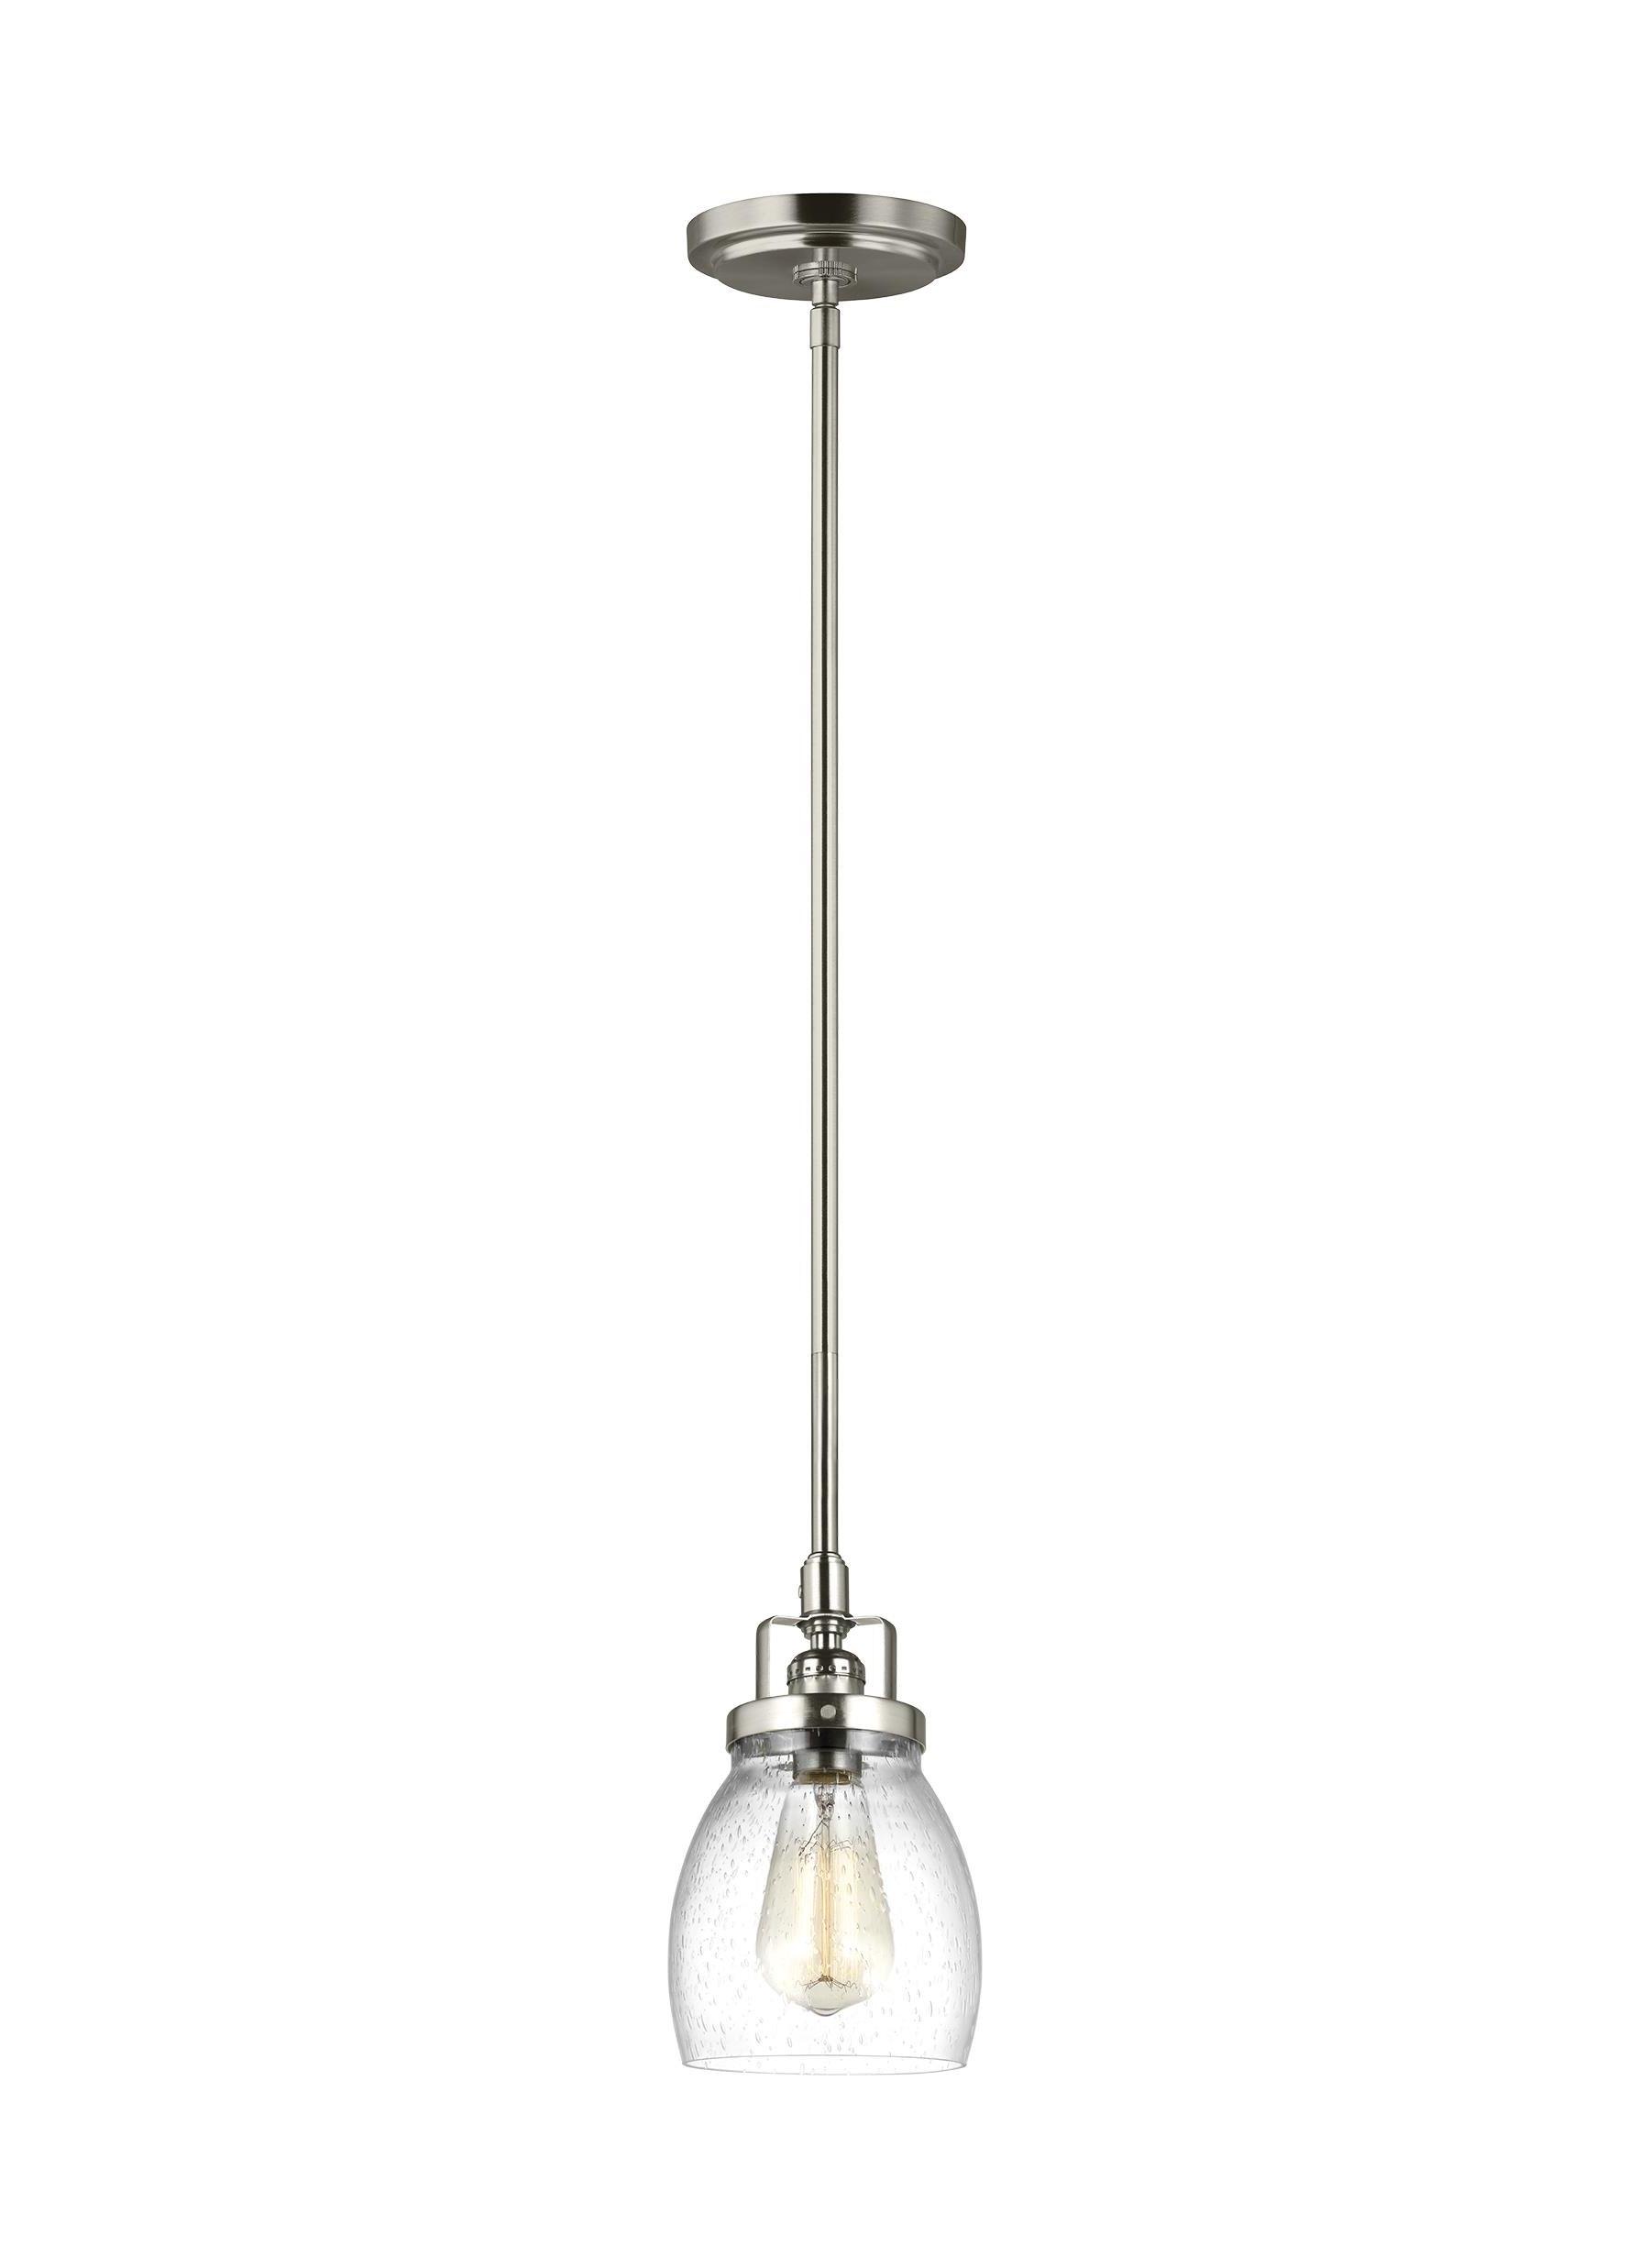 Famous Houon 1 Light Cone Bell Pendant Regarding Erico 1 Light Single Bell Pendants (View 10 of 25)